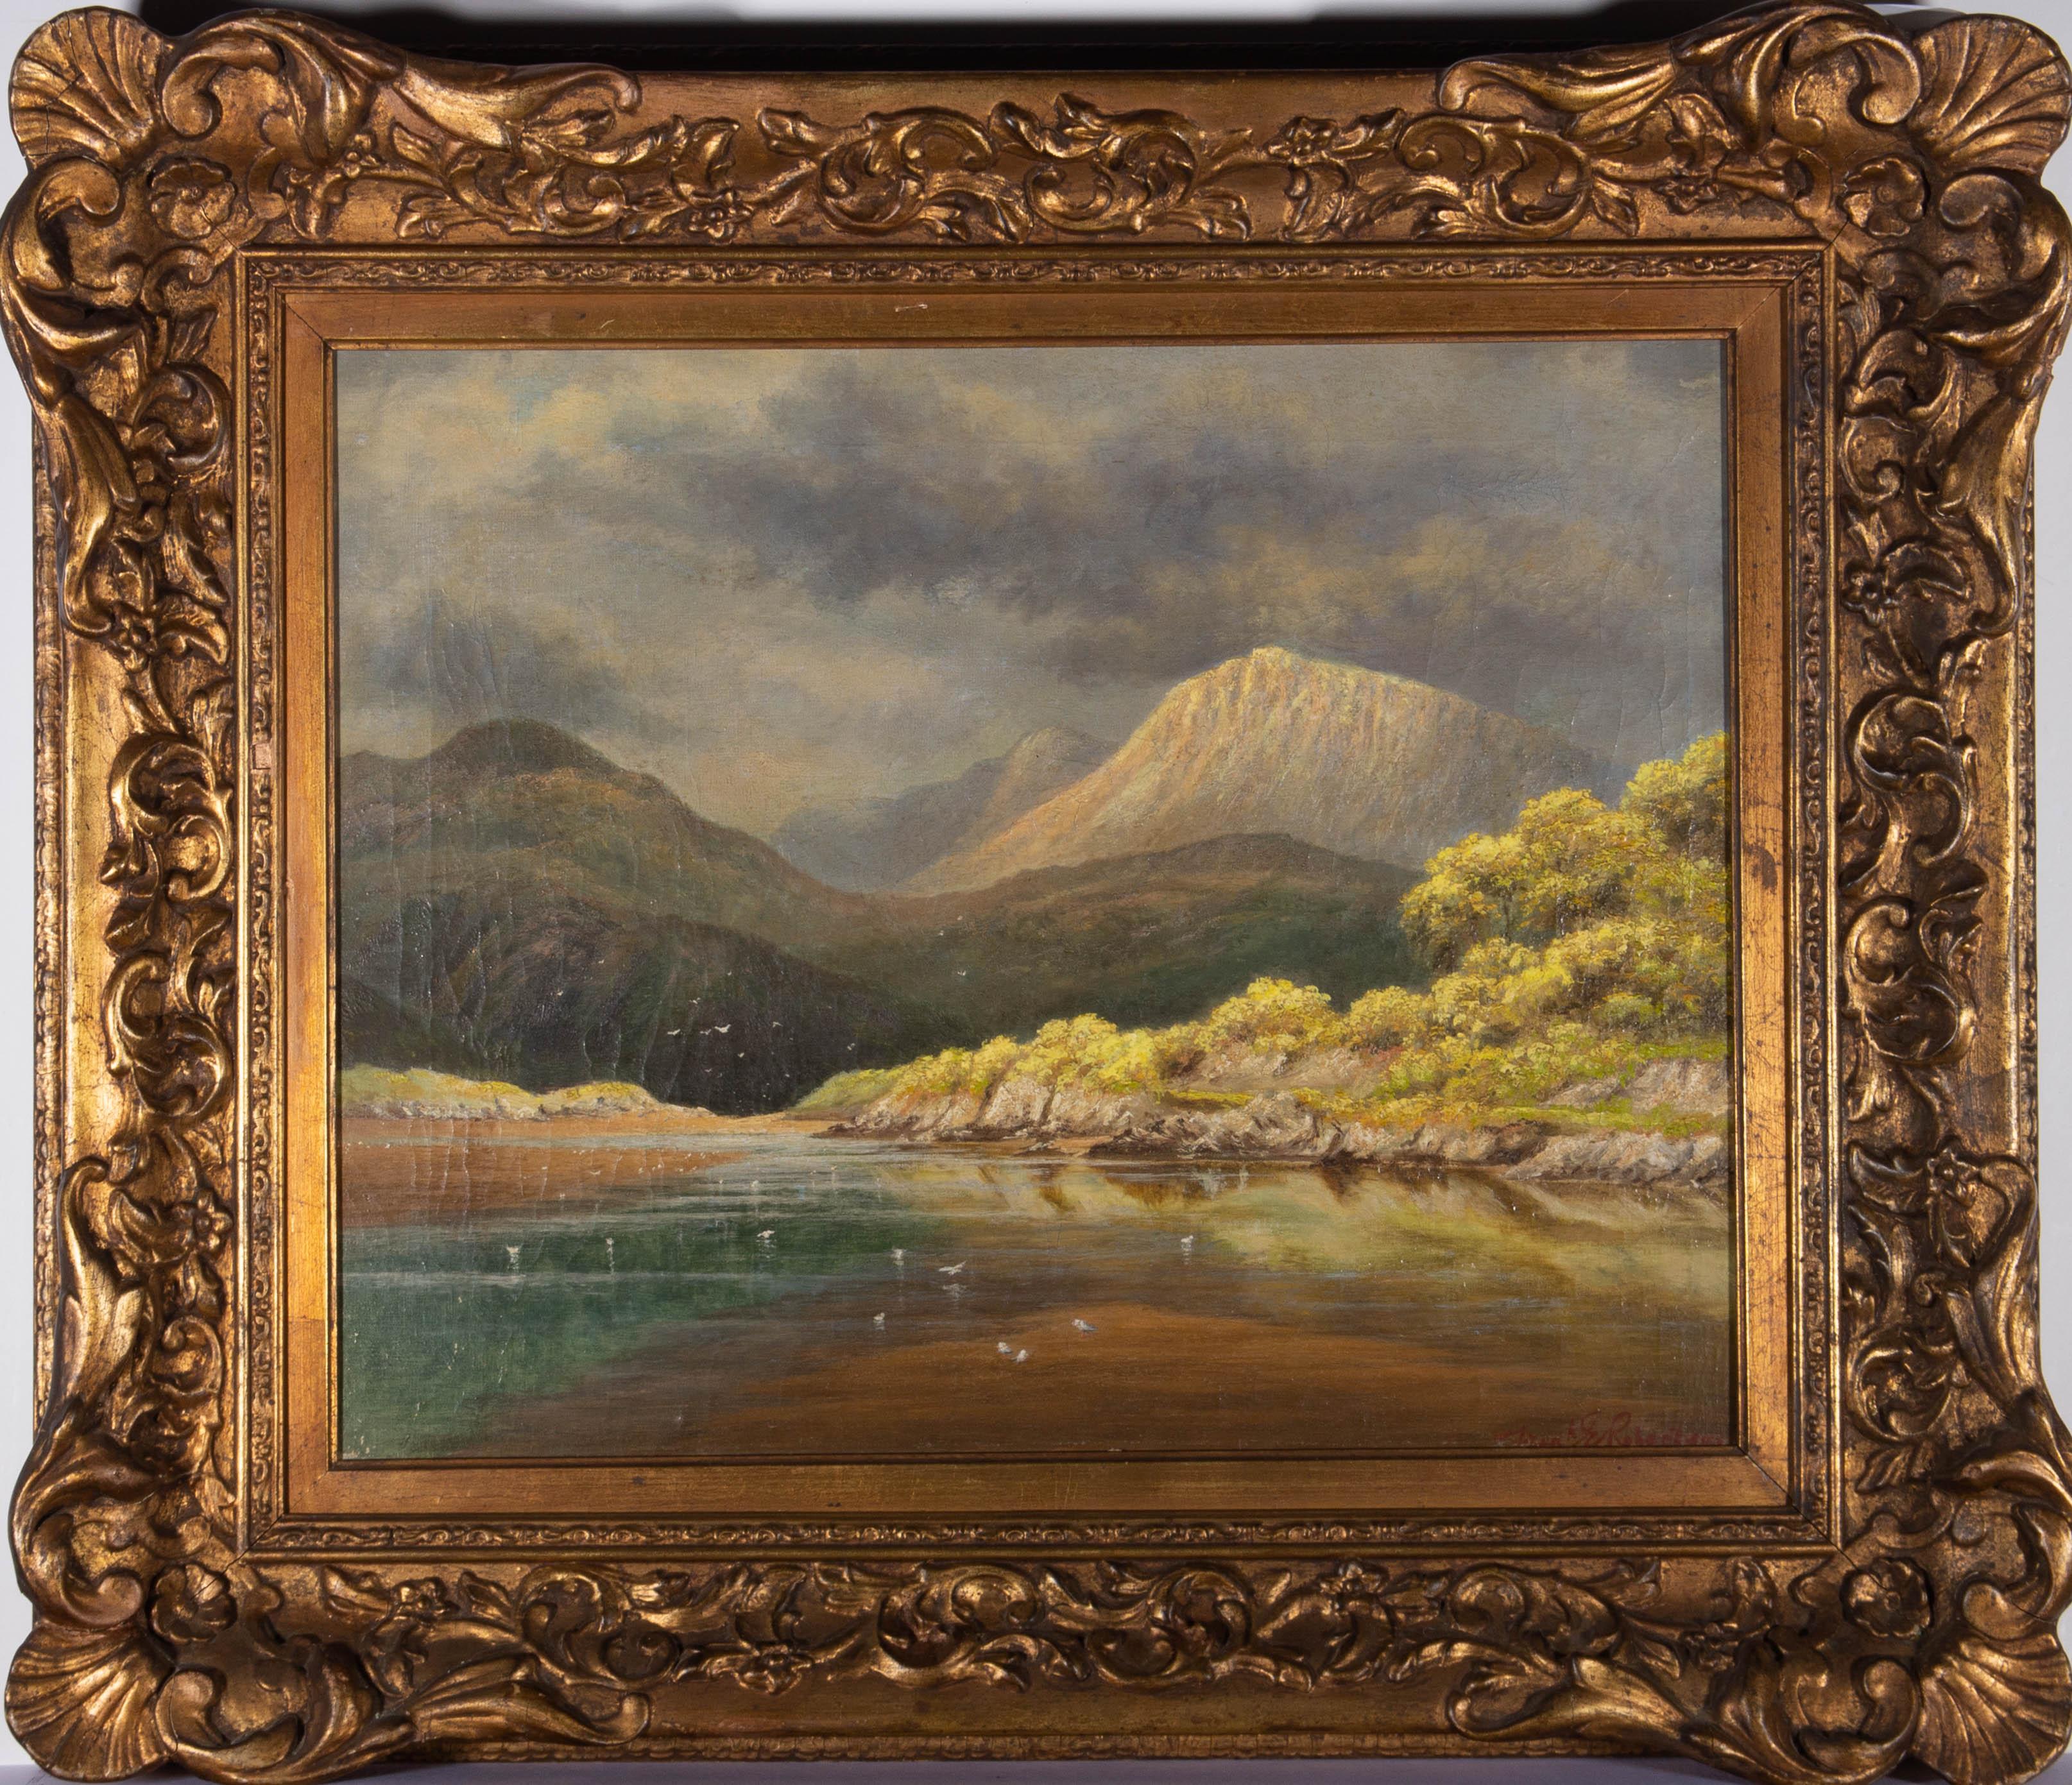 Fred E. Robertson (1878-1953) - Early 20th Century Oil, Mountain Lake